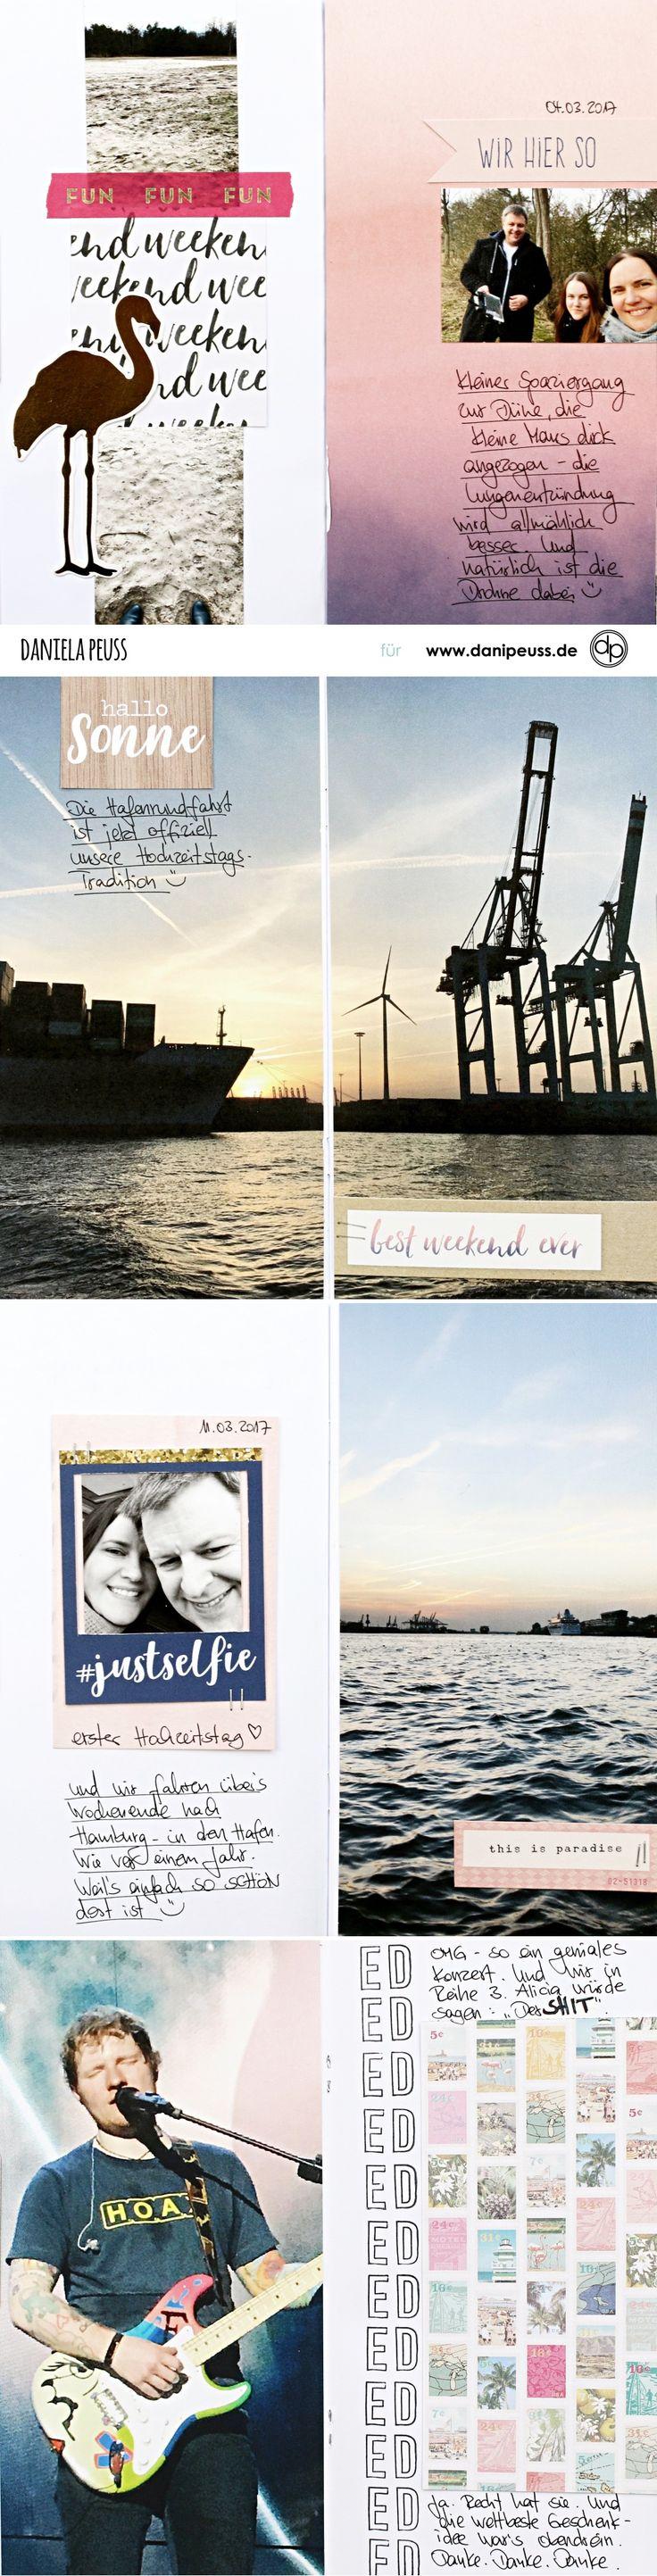 danidori Memory Notebook mit dem Aprilkit | von Dani für www.danipeuss.de